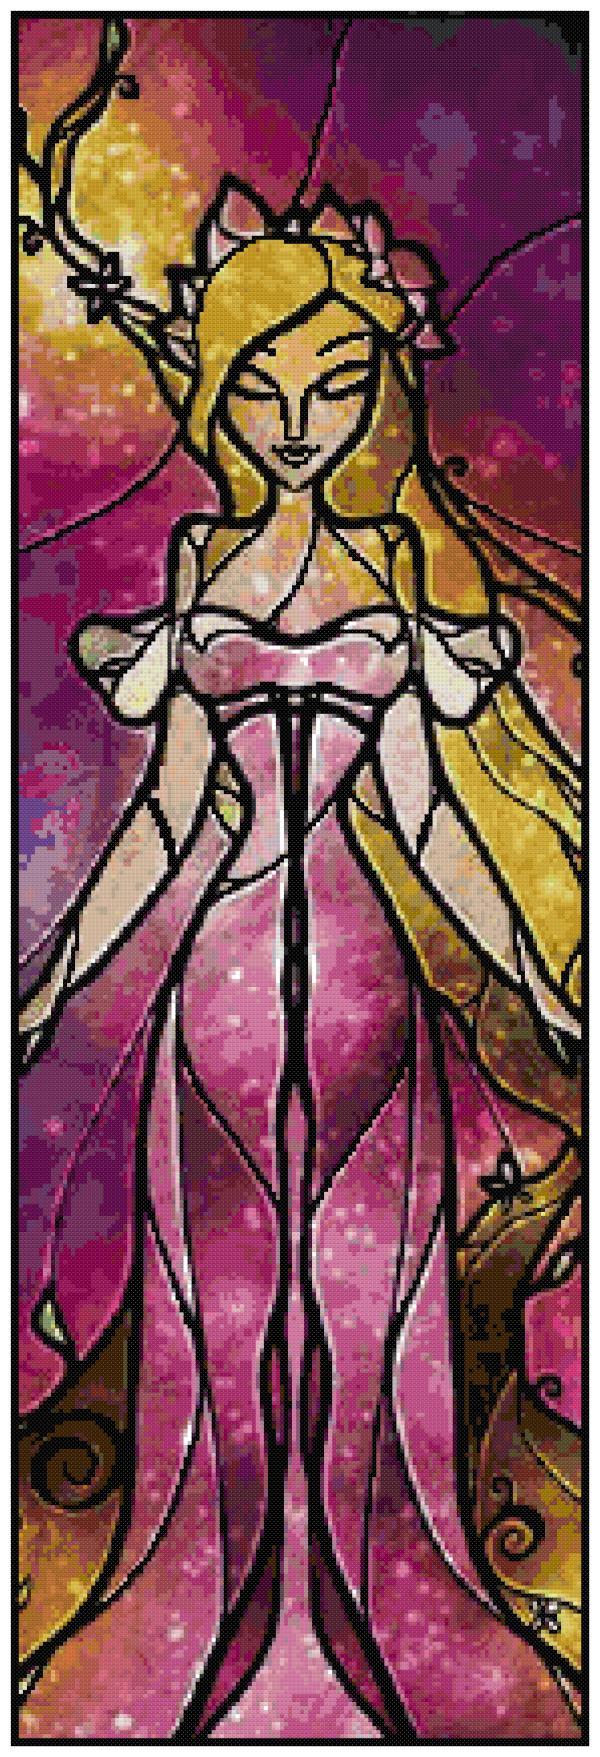 Giselle Cross Stitch Pattern